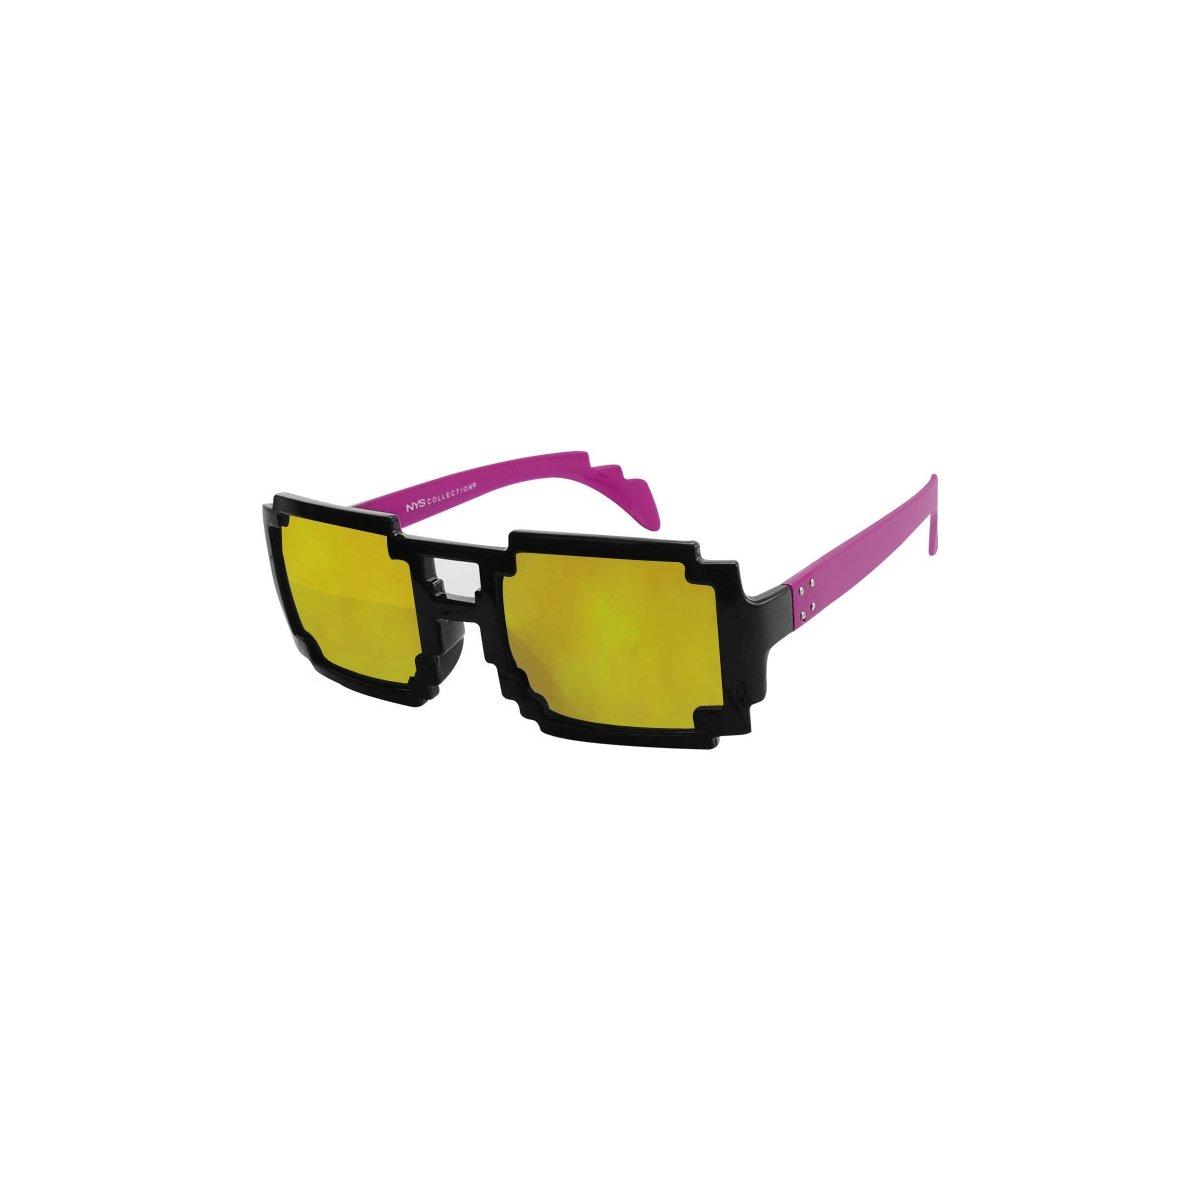 Óculos de Sol NYS Collection 71-7463 - Compre Agora   Netshoes 8fc5045b8e